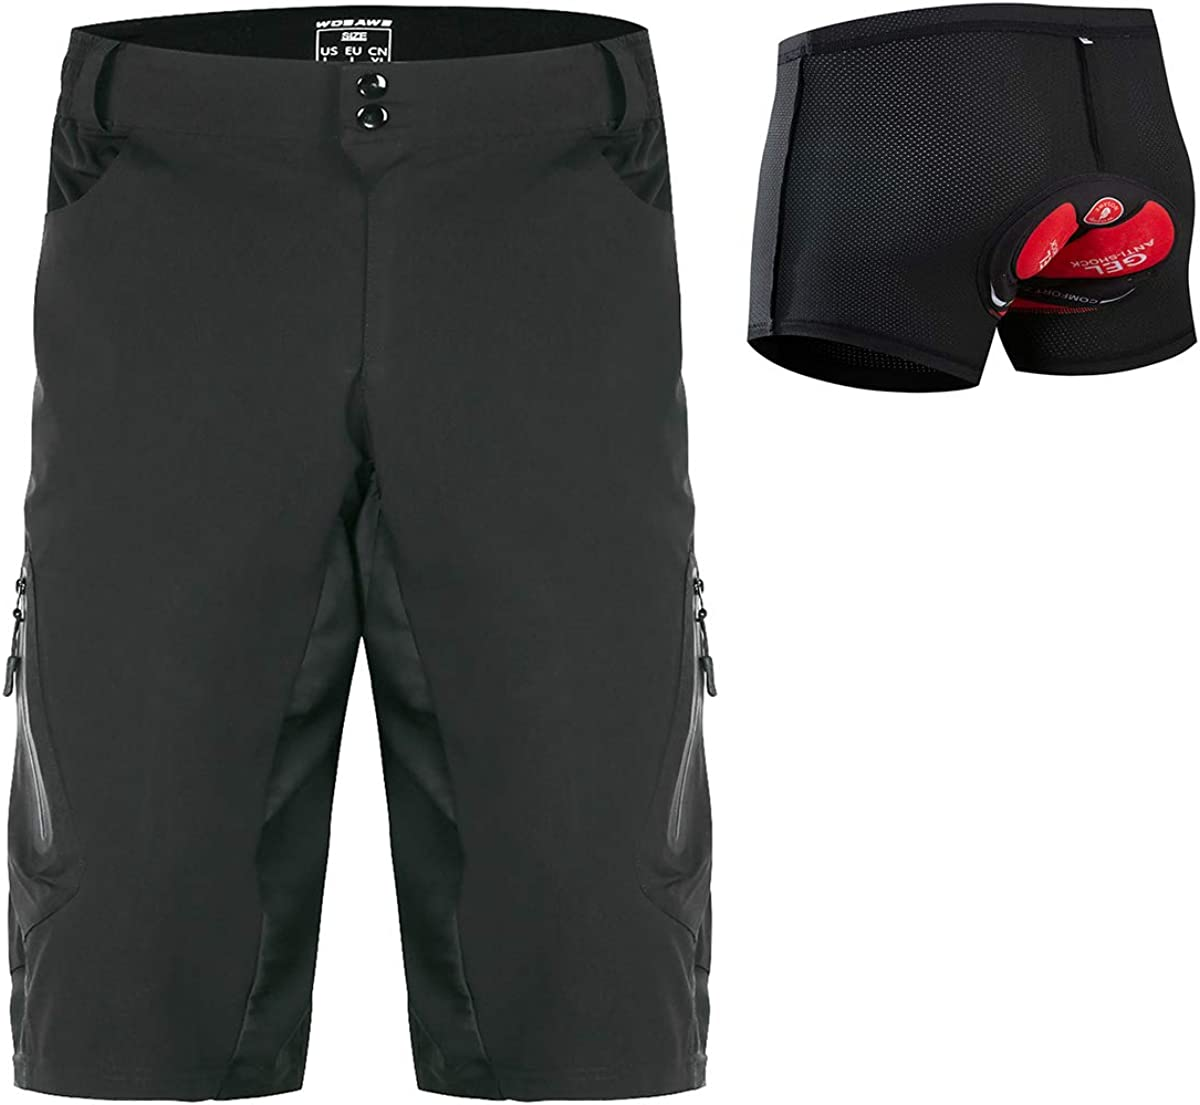 WOSAWE Men/'s Cycling Shorts Riding Bicycle 3D Padded MTB Bike Half Pants Black